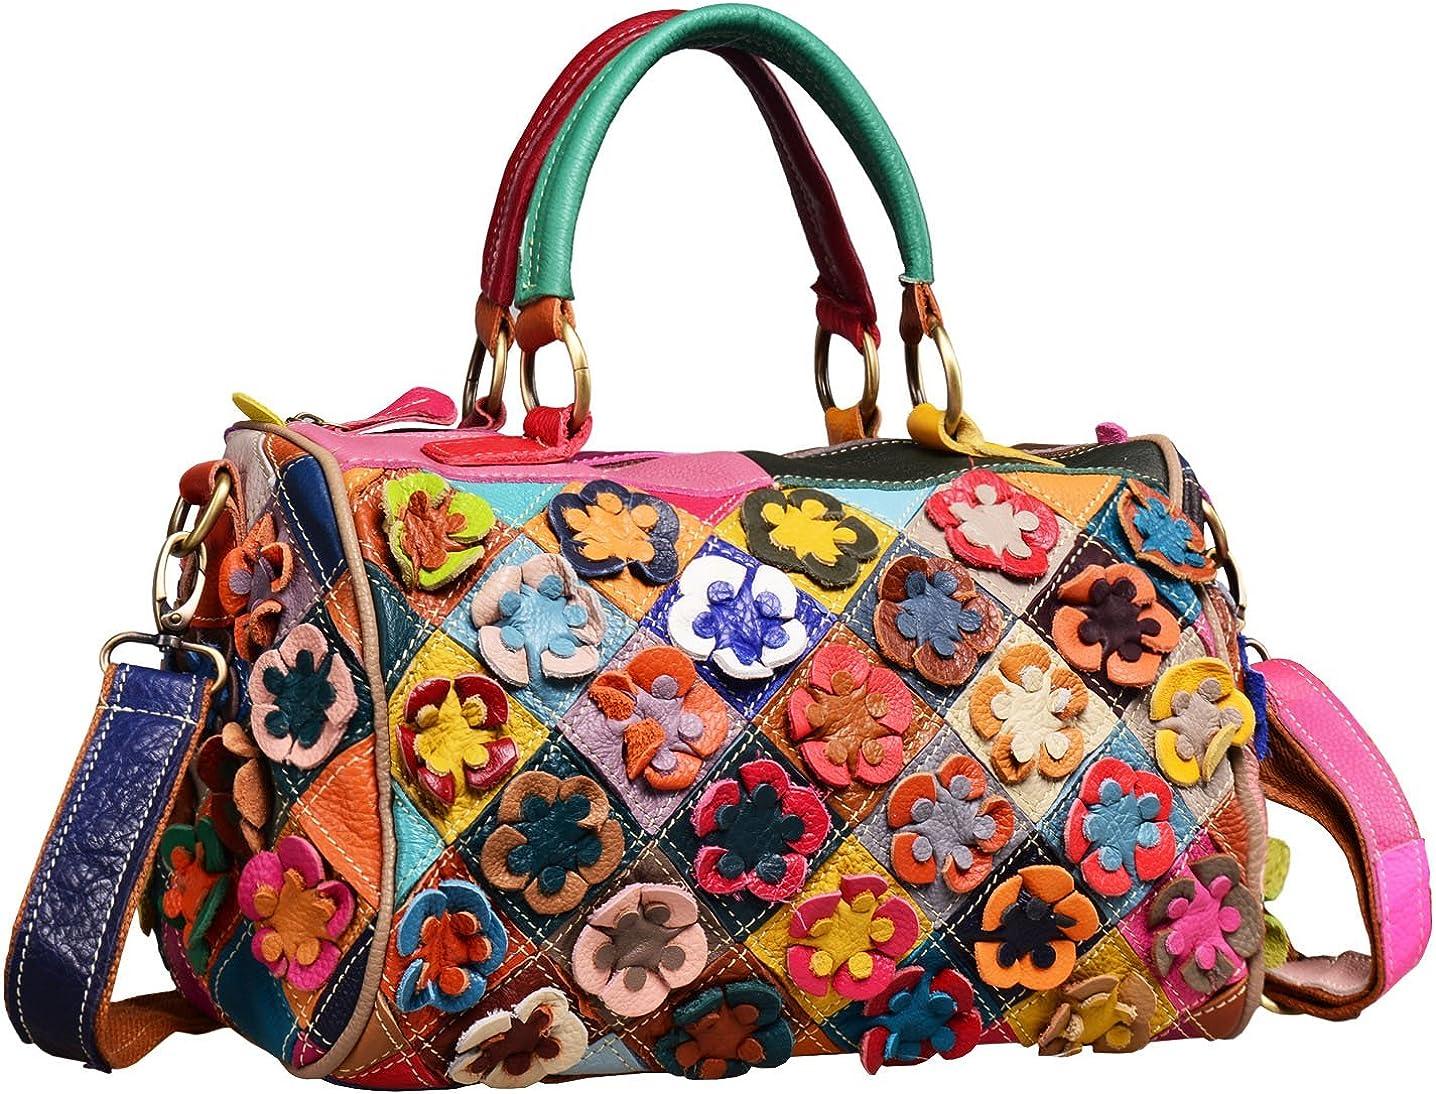 Womens Patterned Check Floral Tote Bag Ladies Handbag Fashion Shoulder Bag